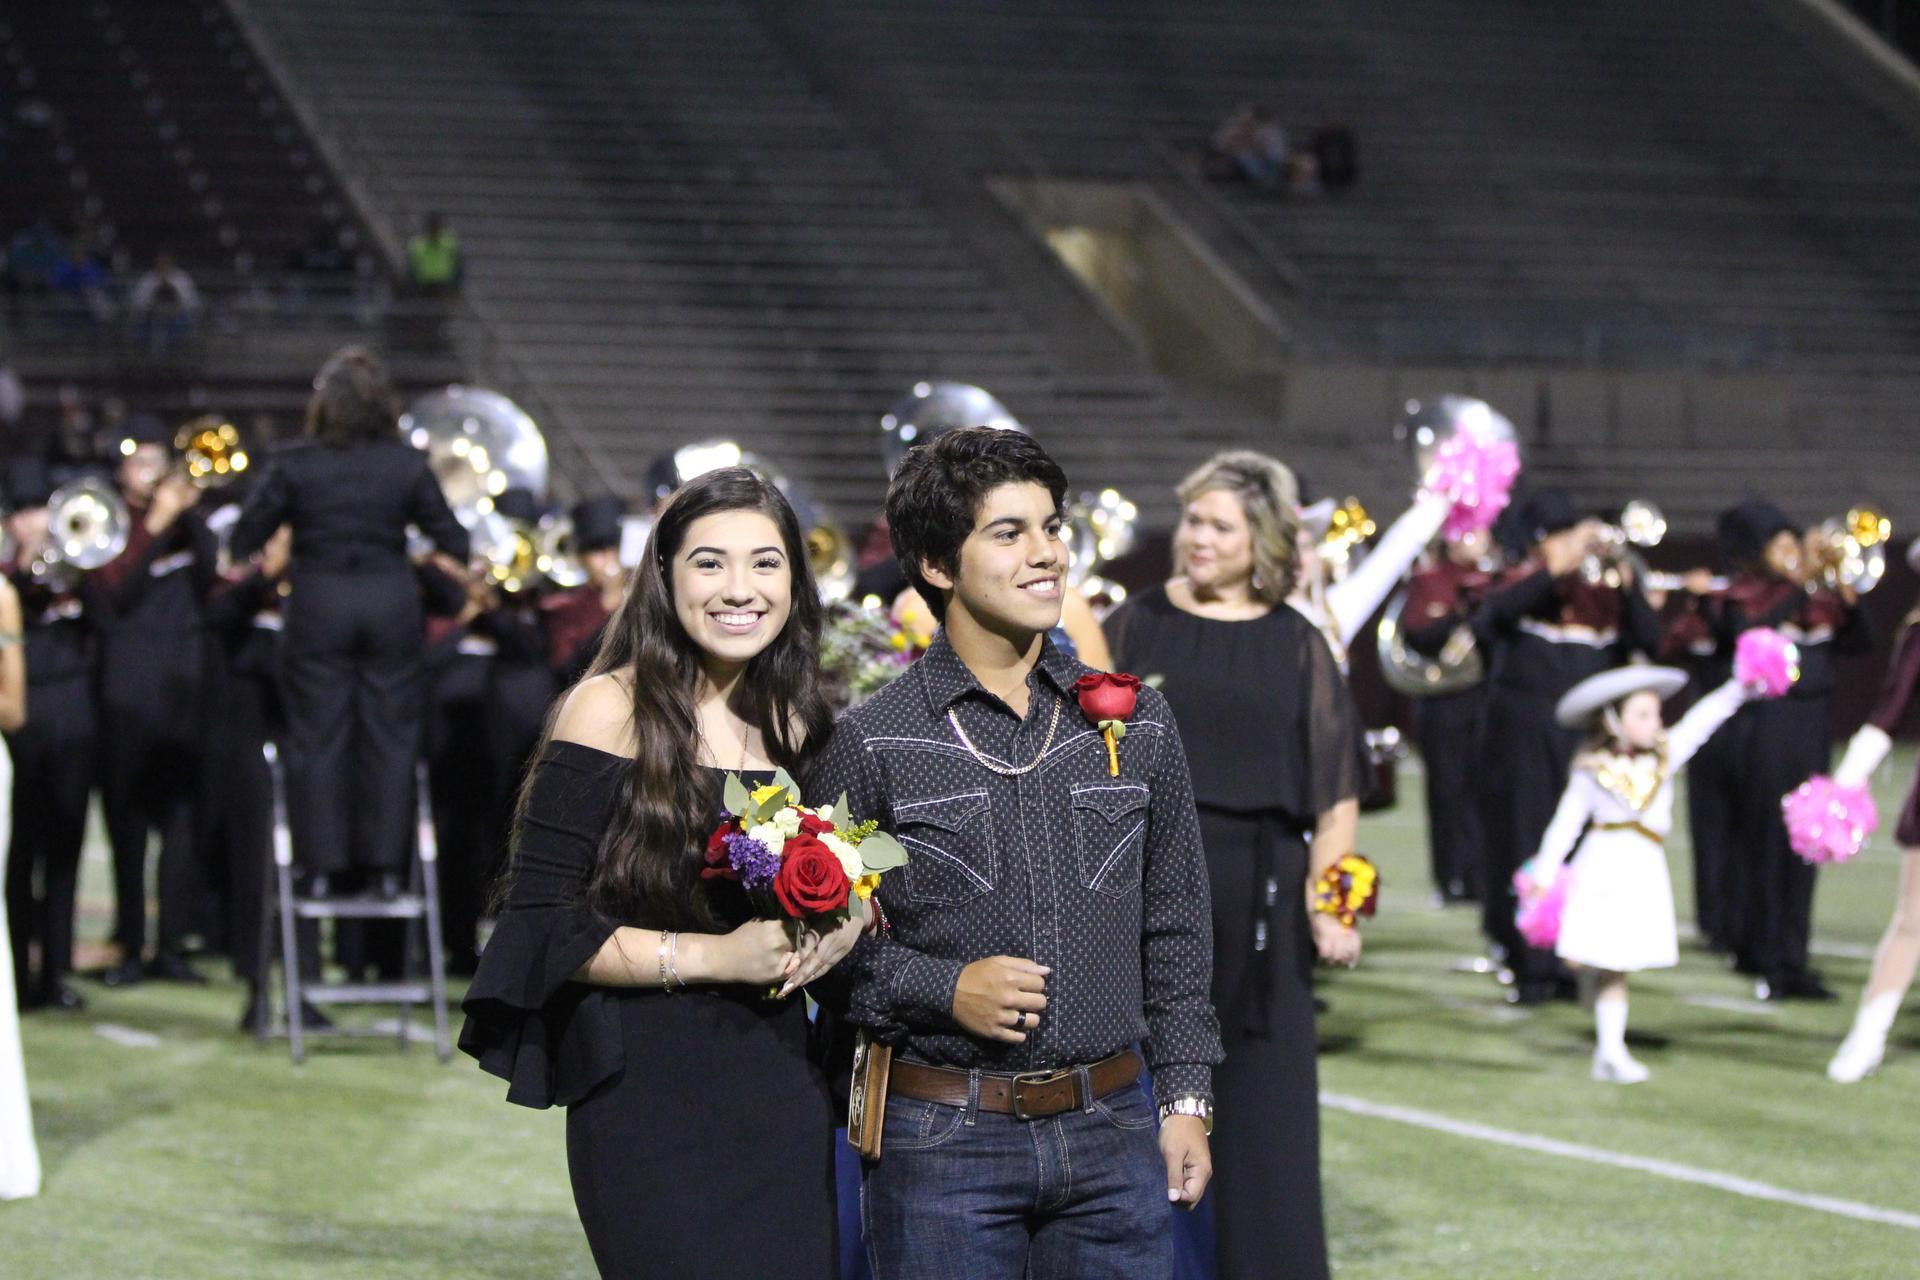 Photo of Deer Park High School Homecoming event